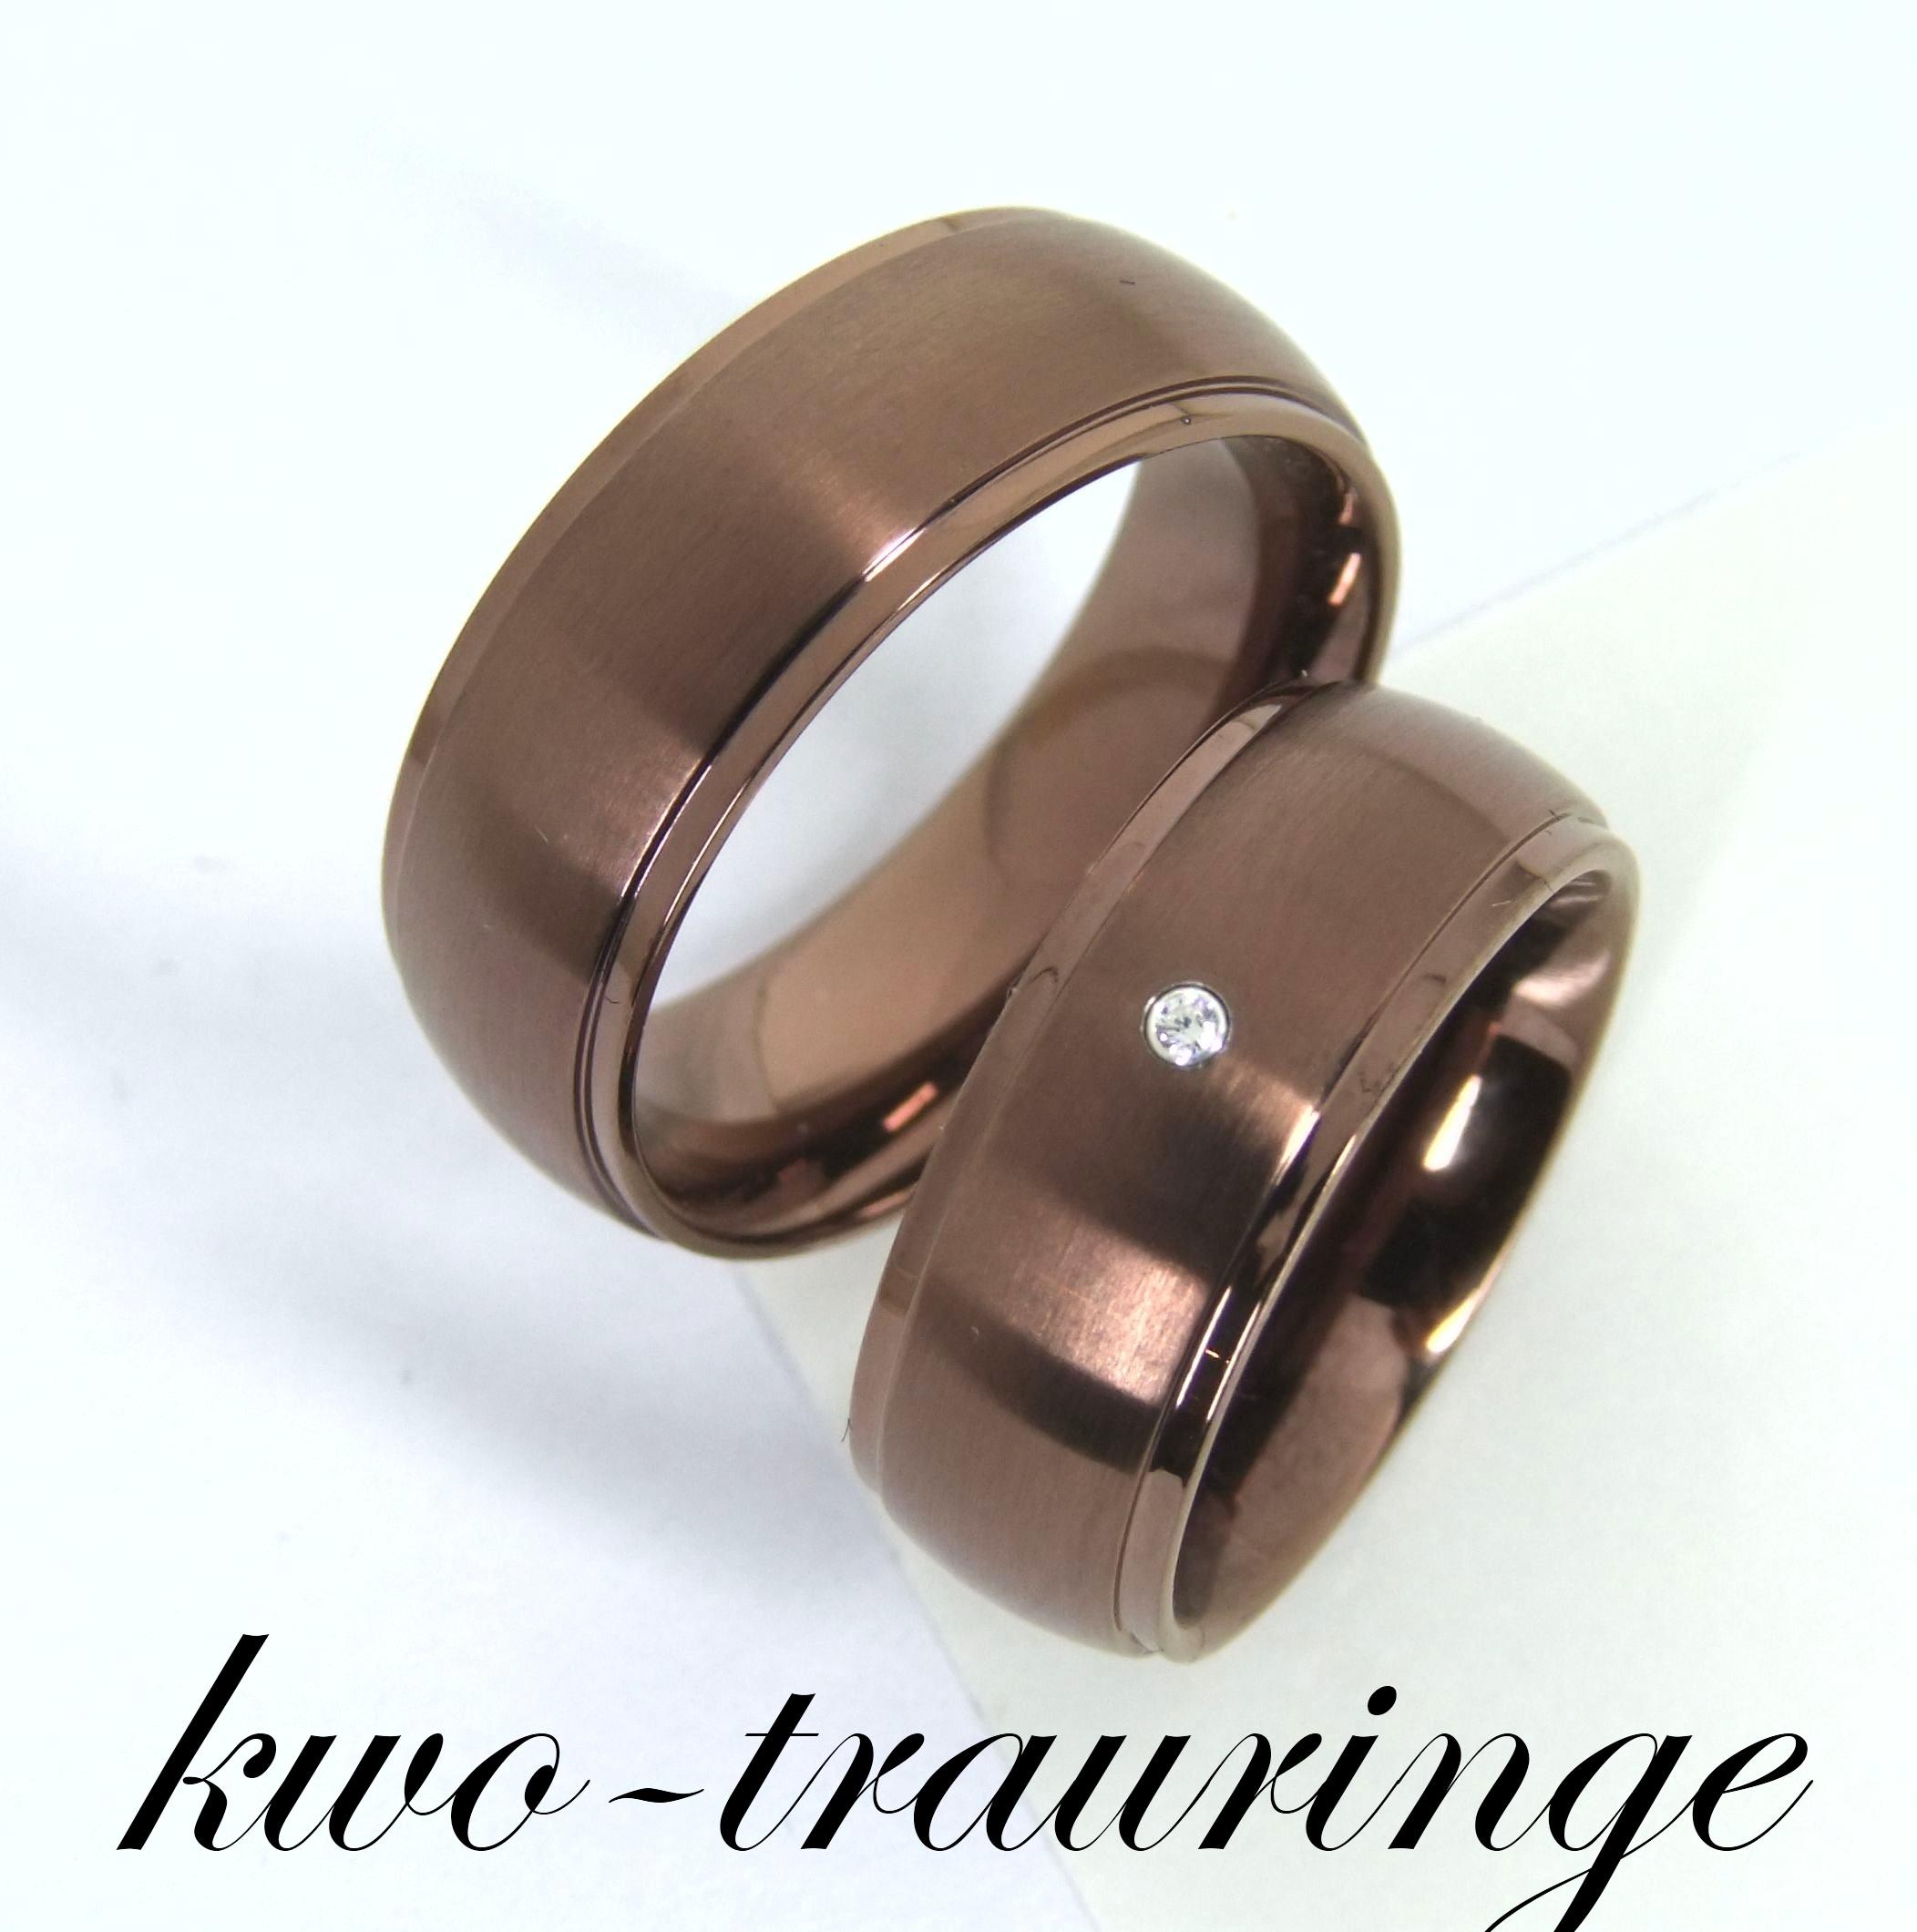 Eheringe Paarringe Hochzeitsringe Trauringe Verlobungsringe Ringe ...